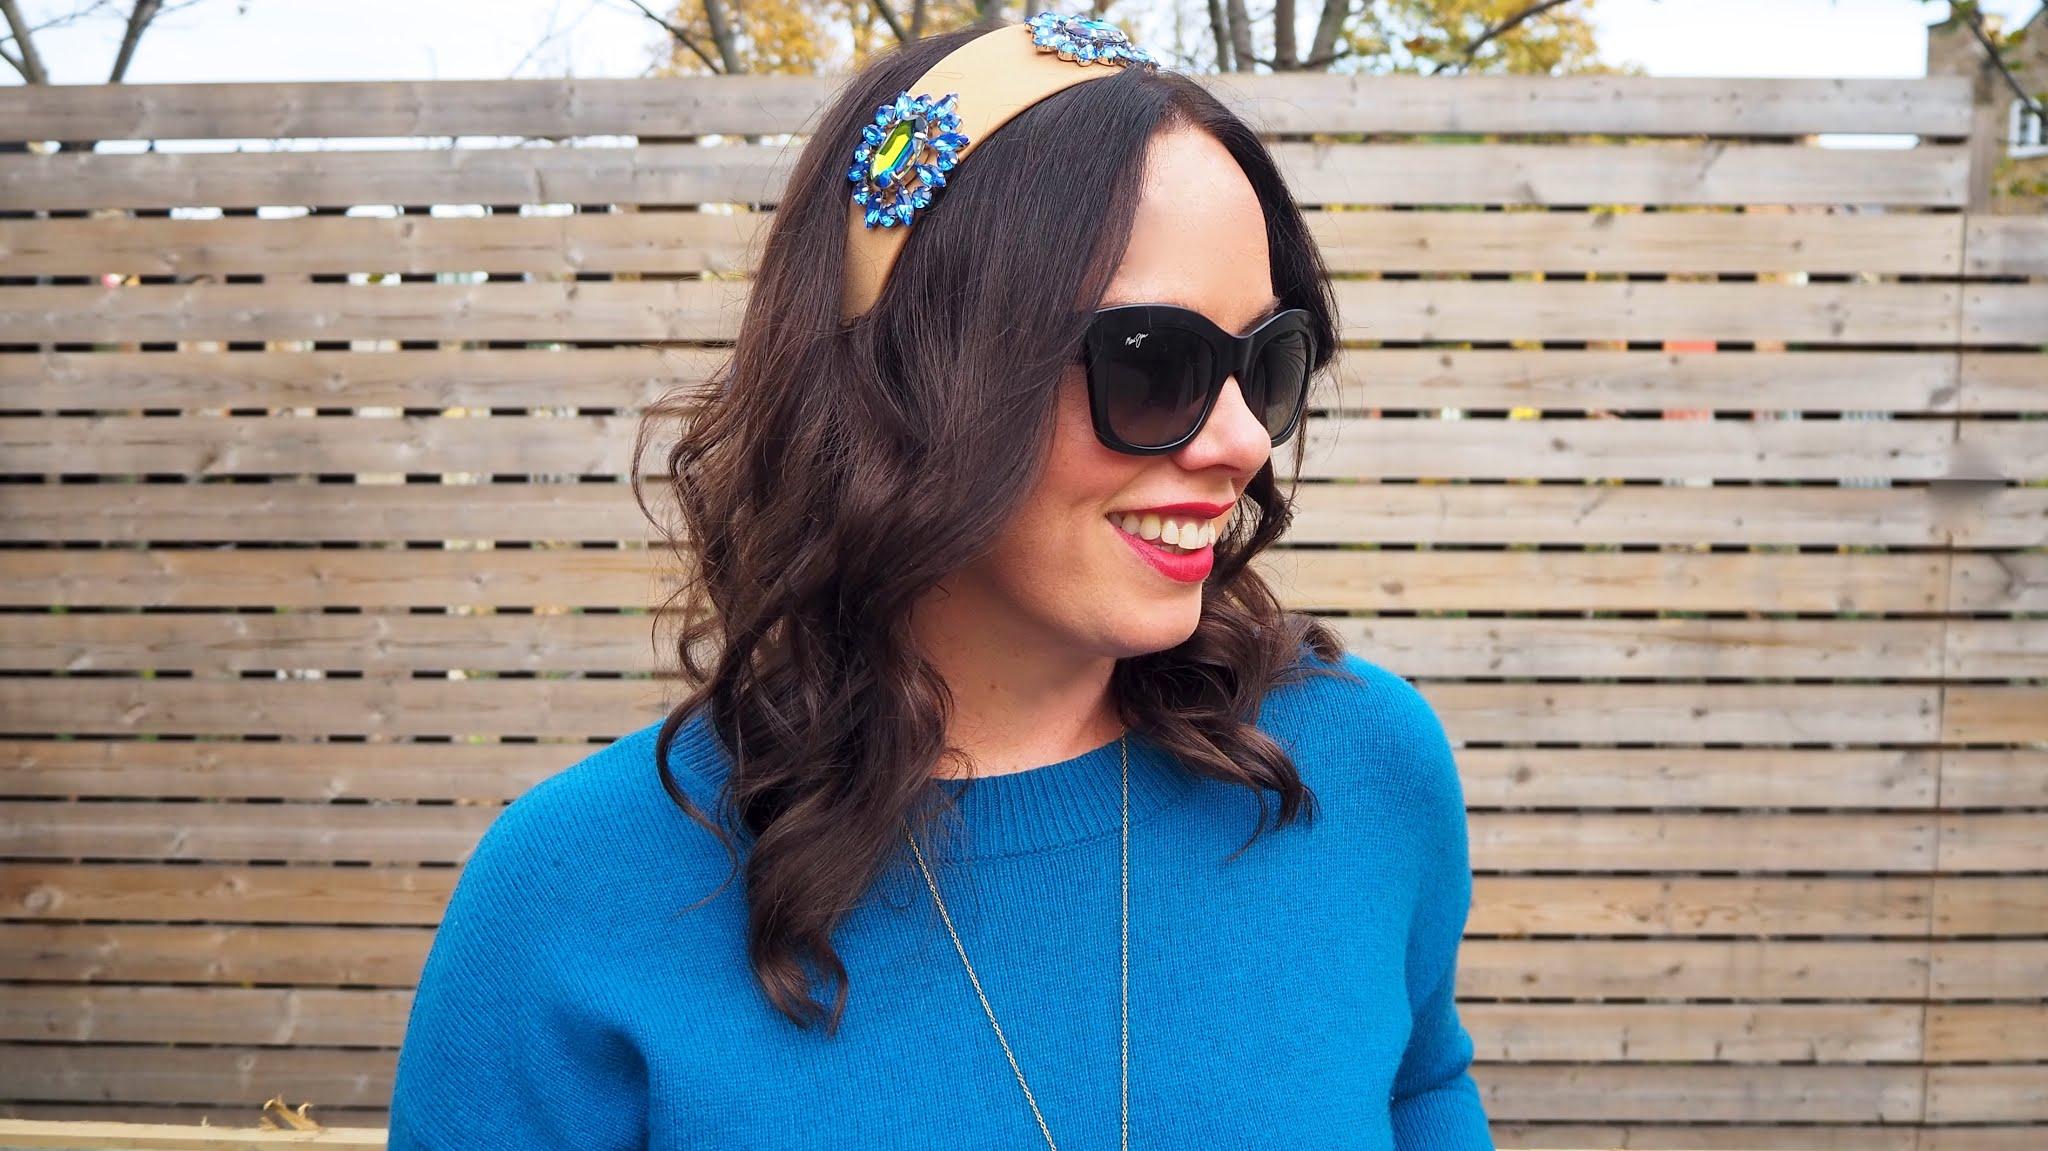 Golden Satin Headband with Blue & Green Jewel Embellishments